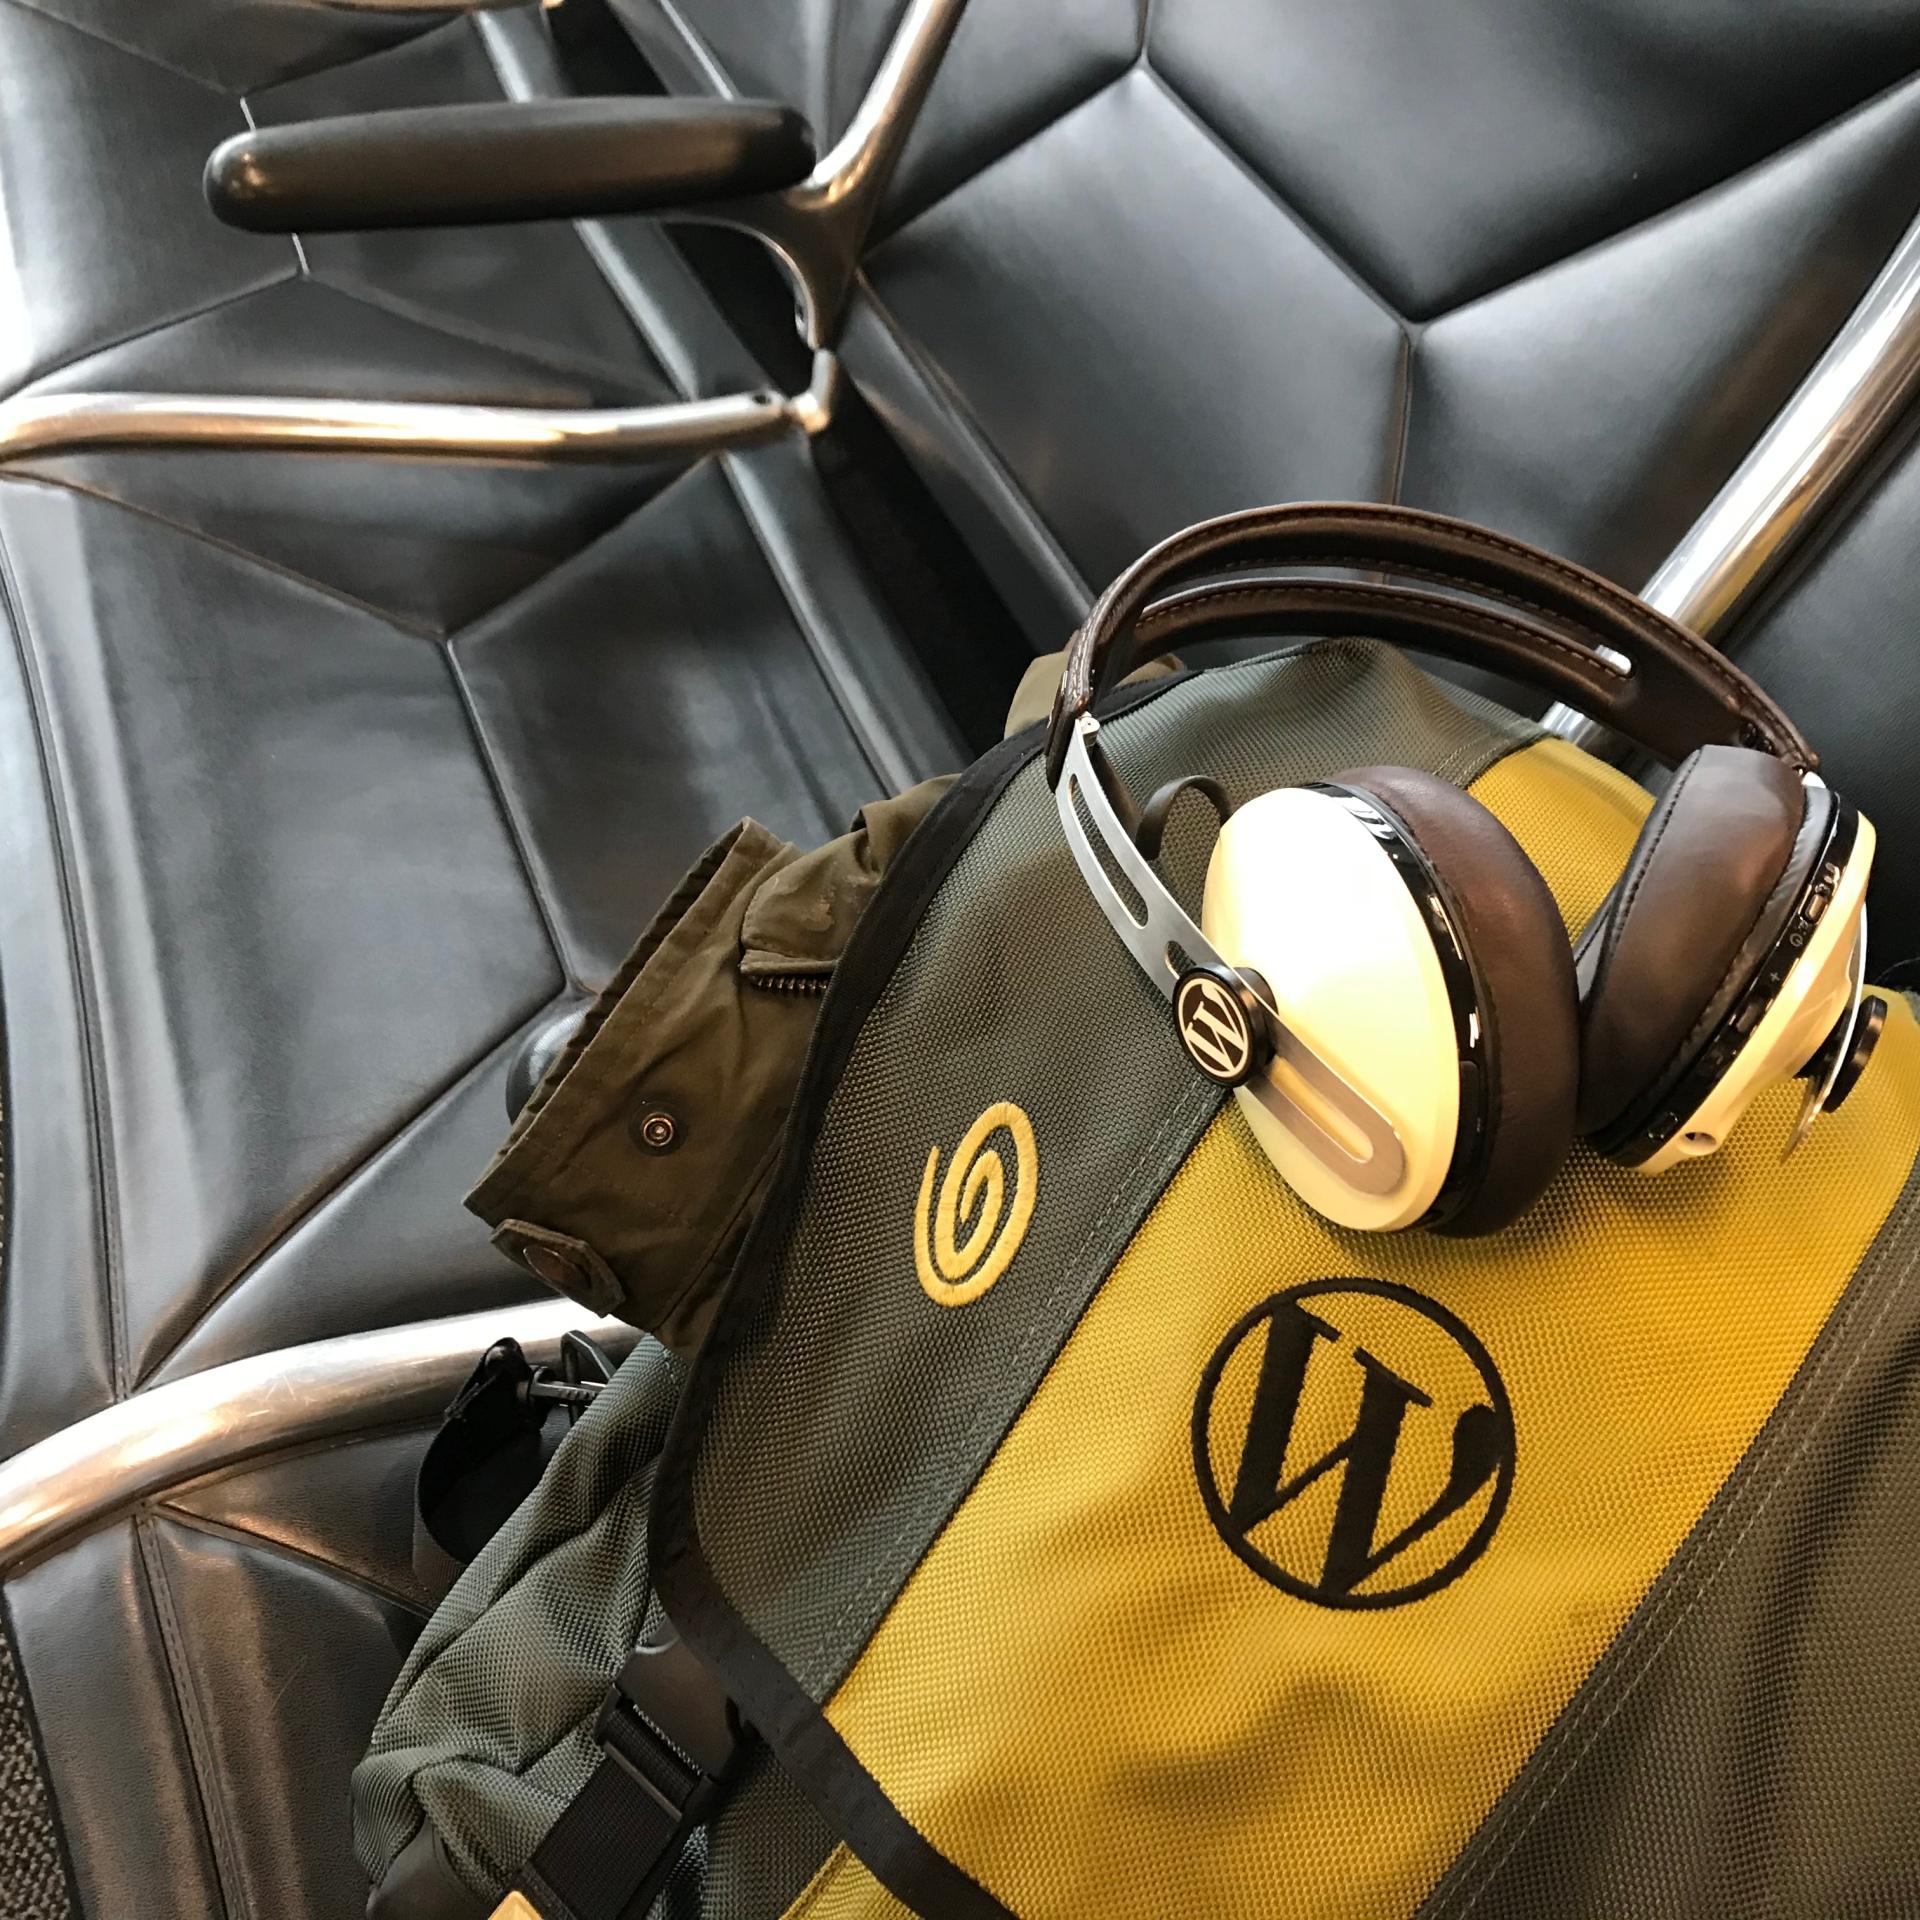 WordPress logos on backpack and headphones in airport